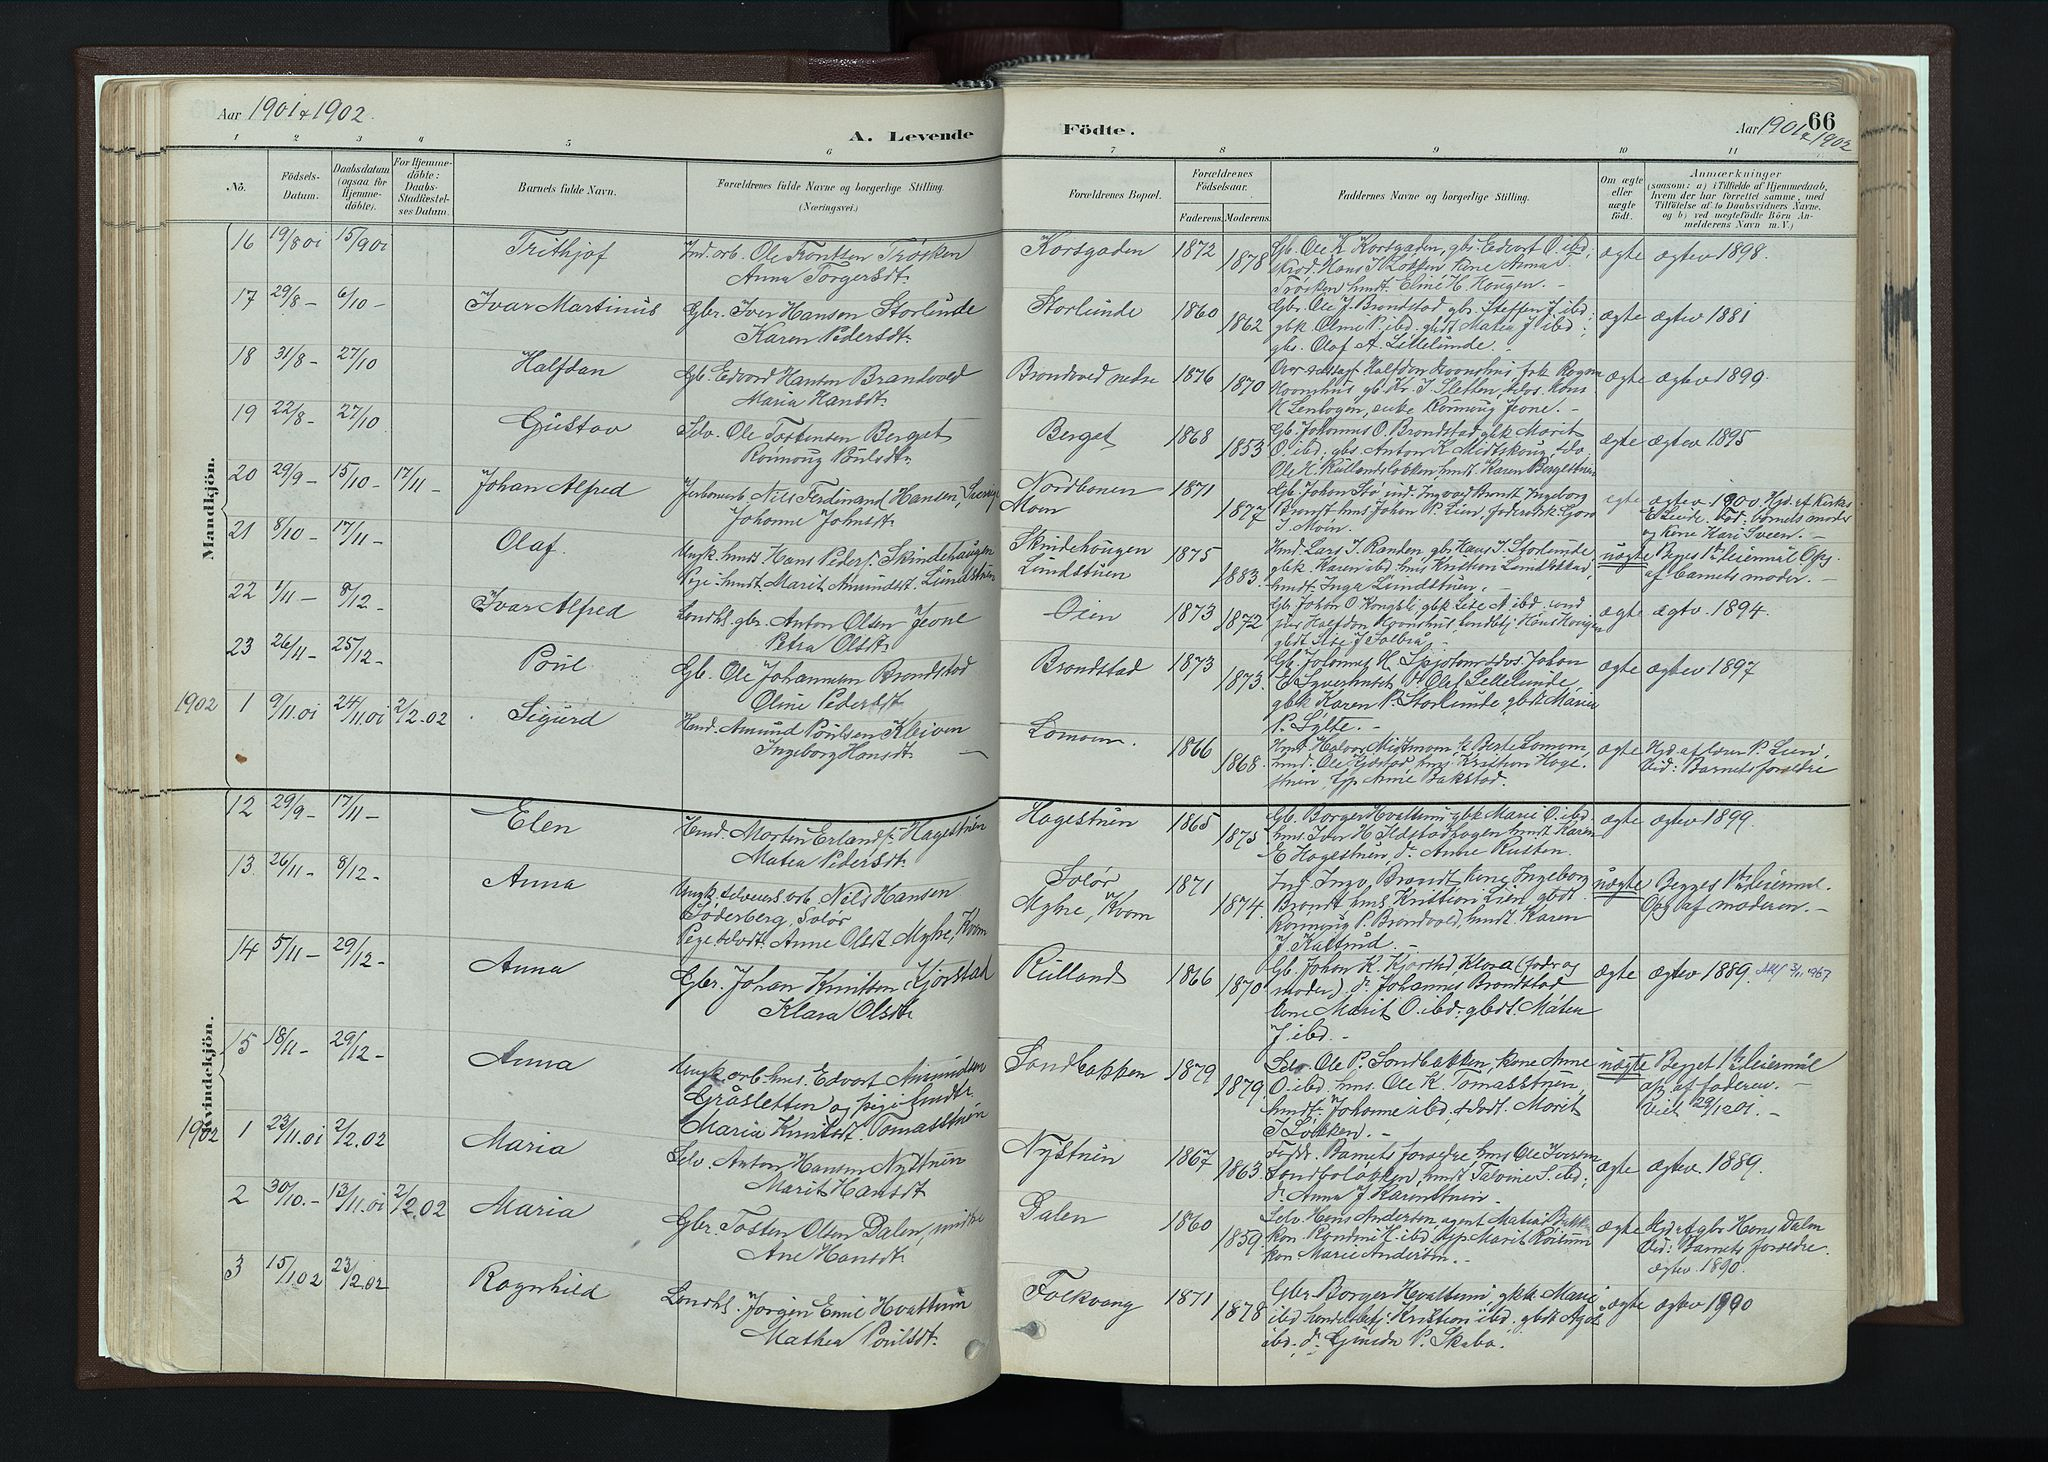 SAH, Nord-Fron prestekontor, Ministerialbok nr. 4, 1884-1914, s. 66